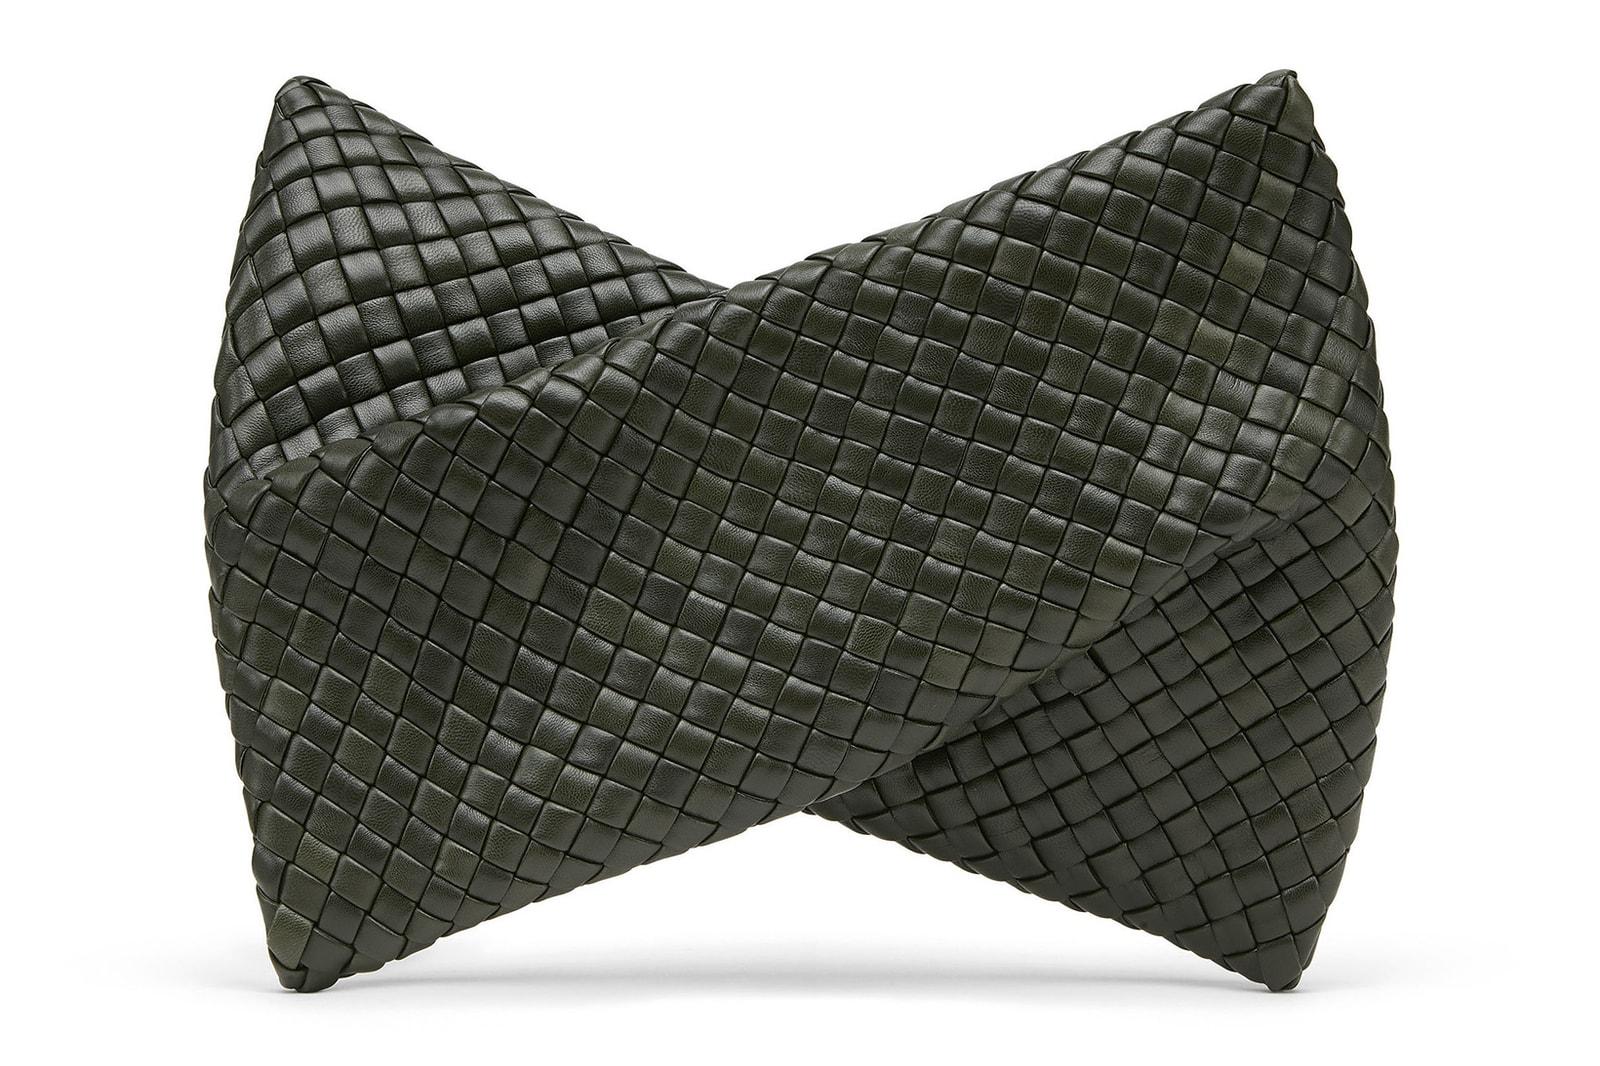 bottega veneta fall winter campaign crisscross clutch fold clasp bag lean puddle boot accessories tyrone lebon